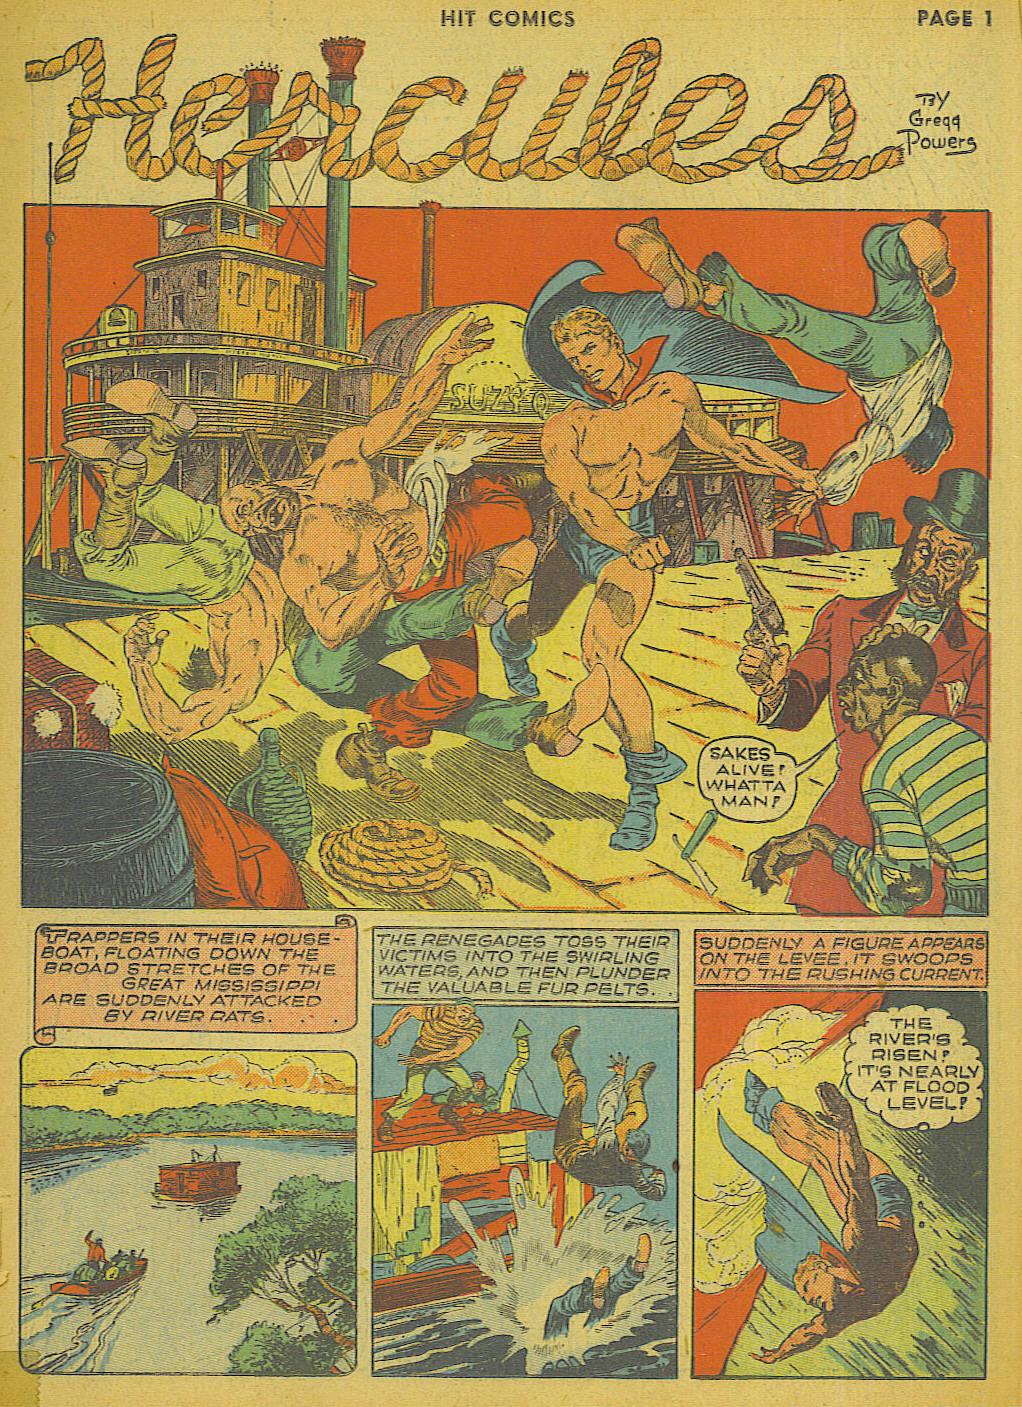 Read online Hit Comics comic -  Issue #13 - 3